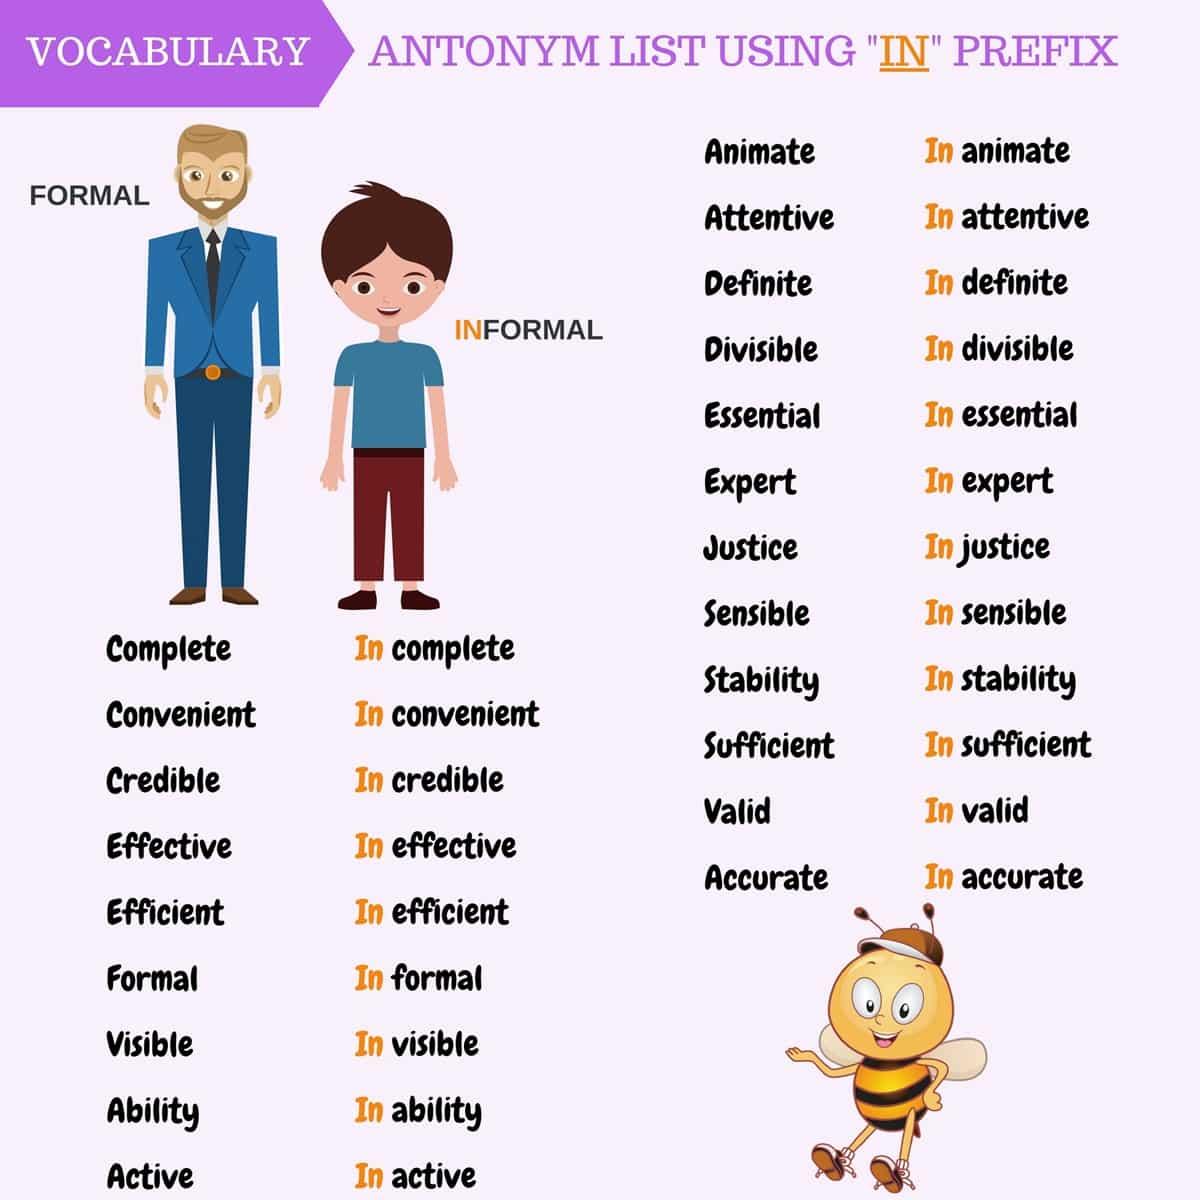 Negative Prefixes Antonyms List Using Popular Prefixes In